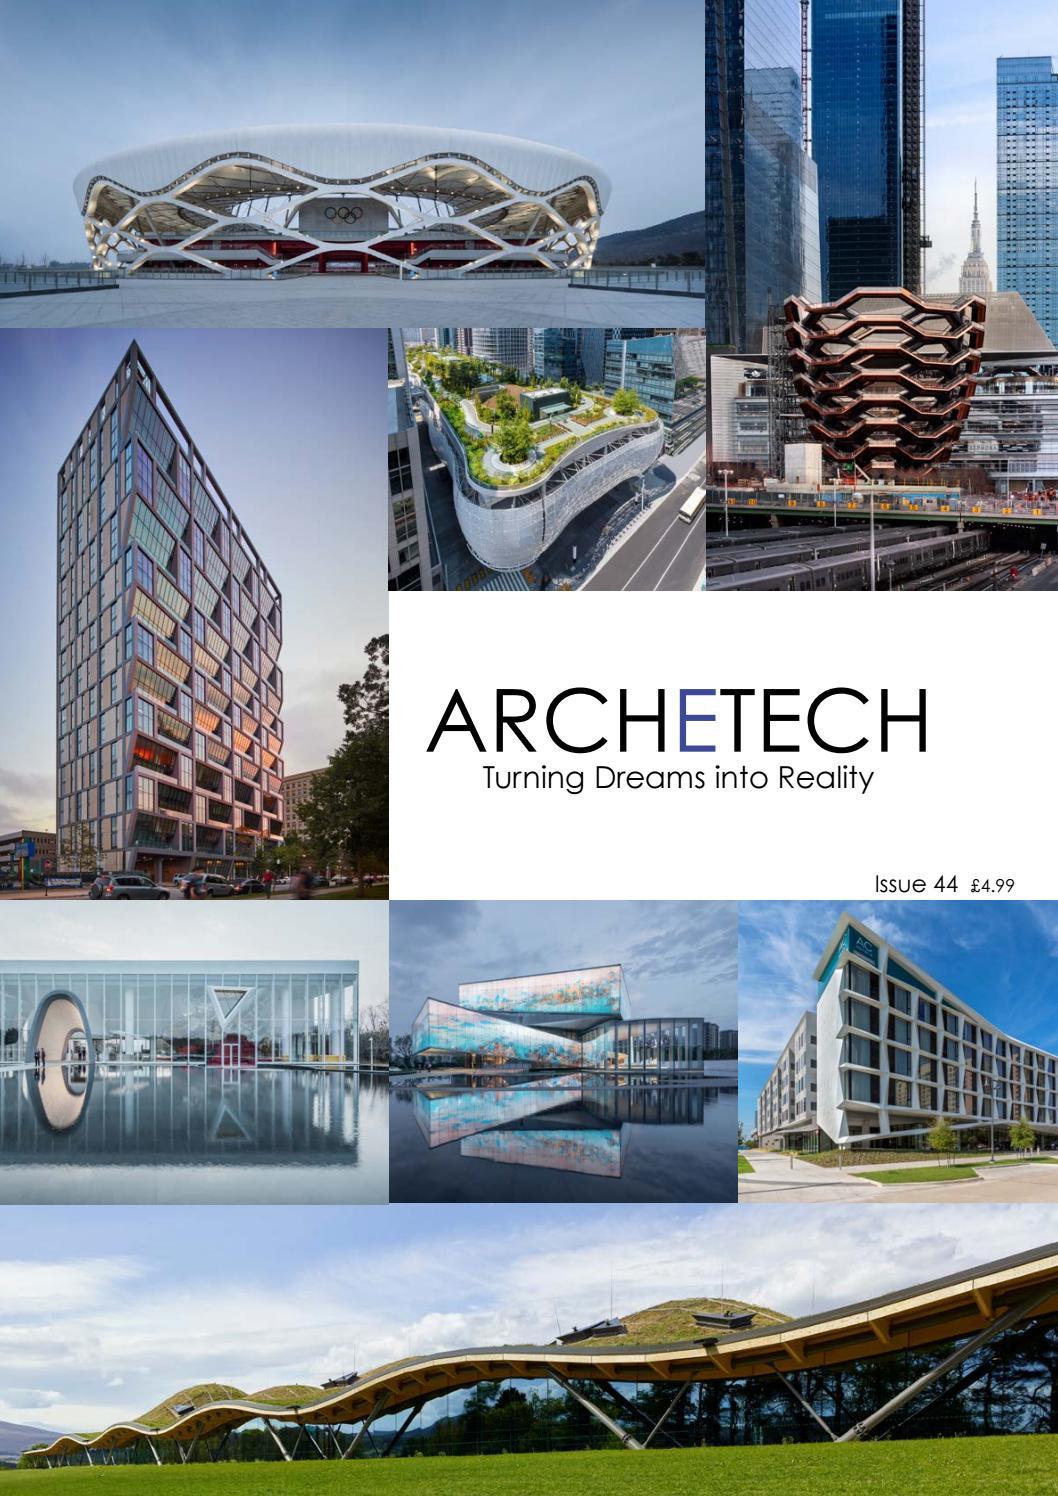 Archetech Issue 44 2019 By Archetech Media Ltd Issuu